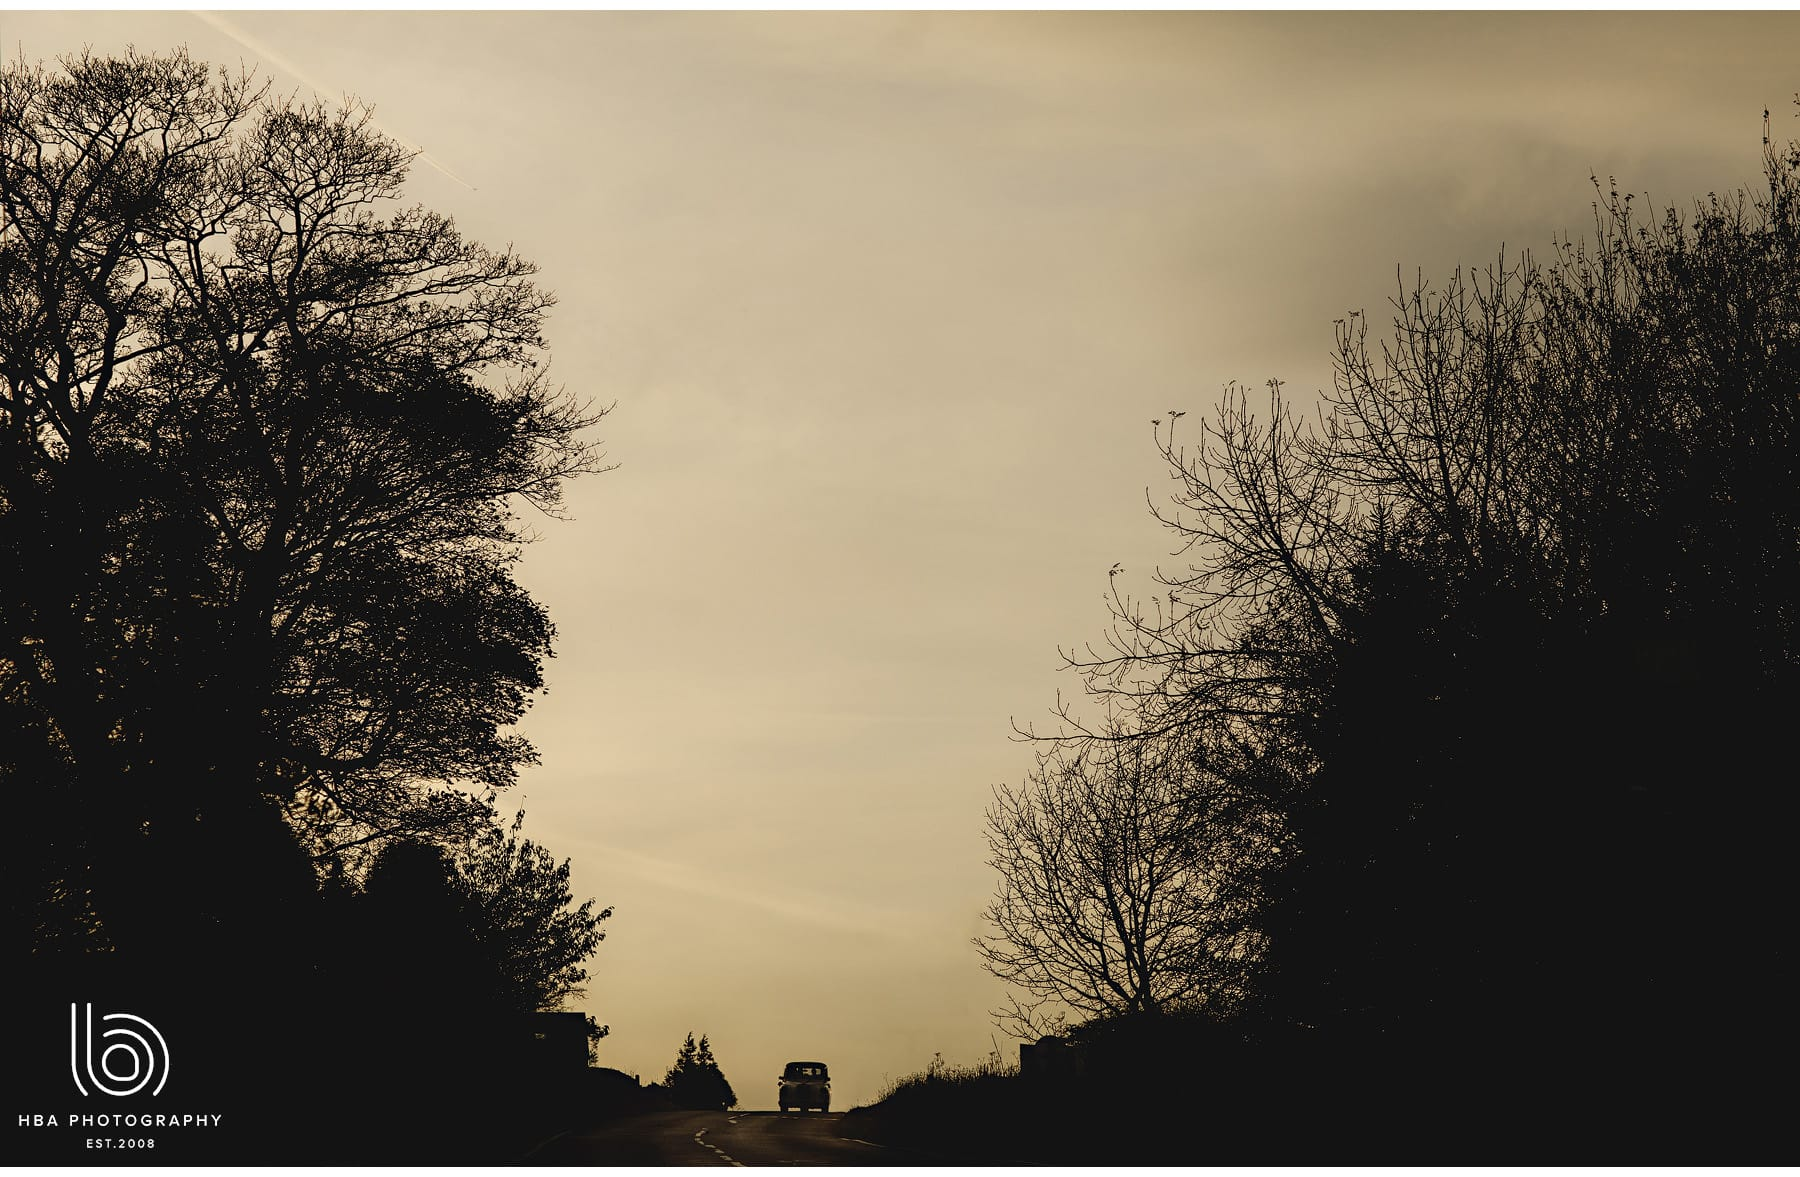 a cloudy autumnal sky